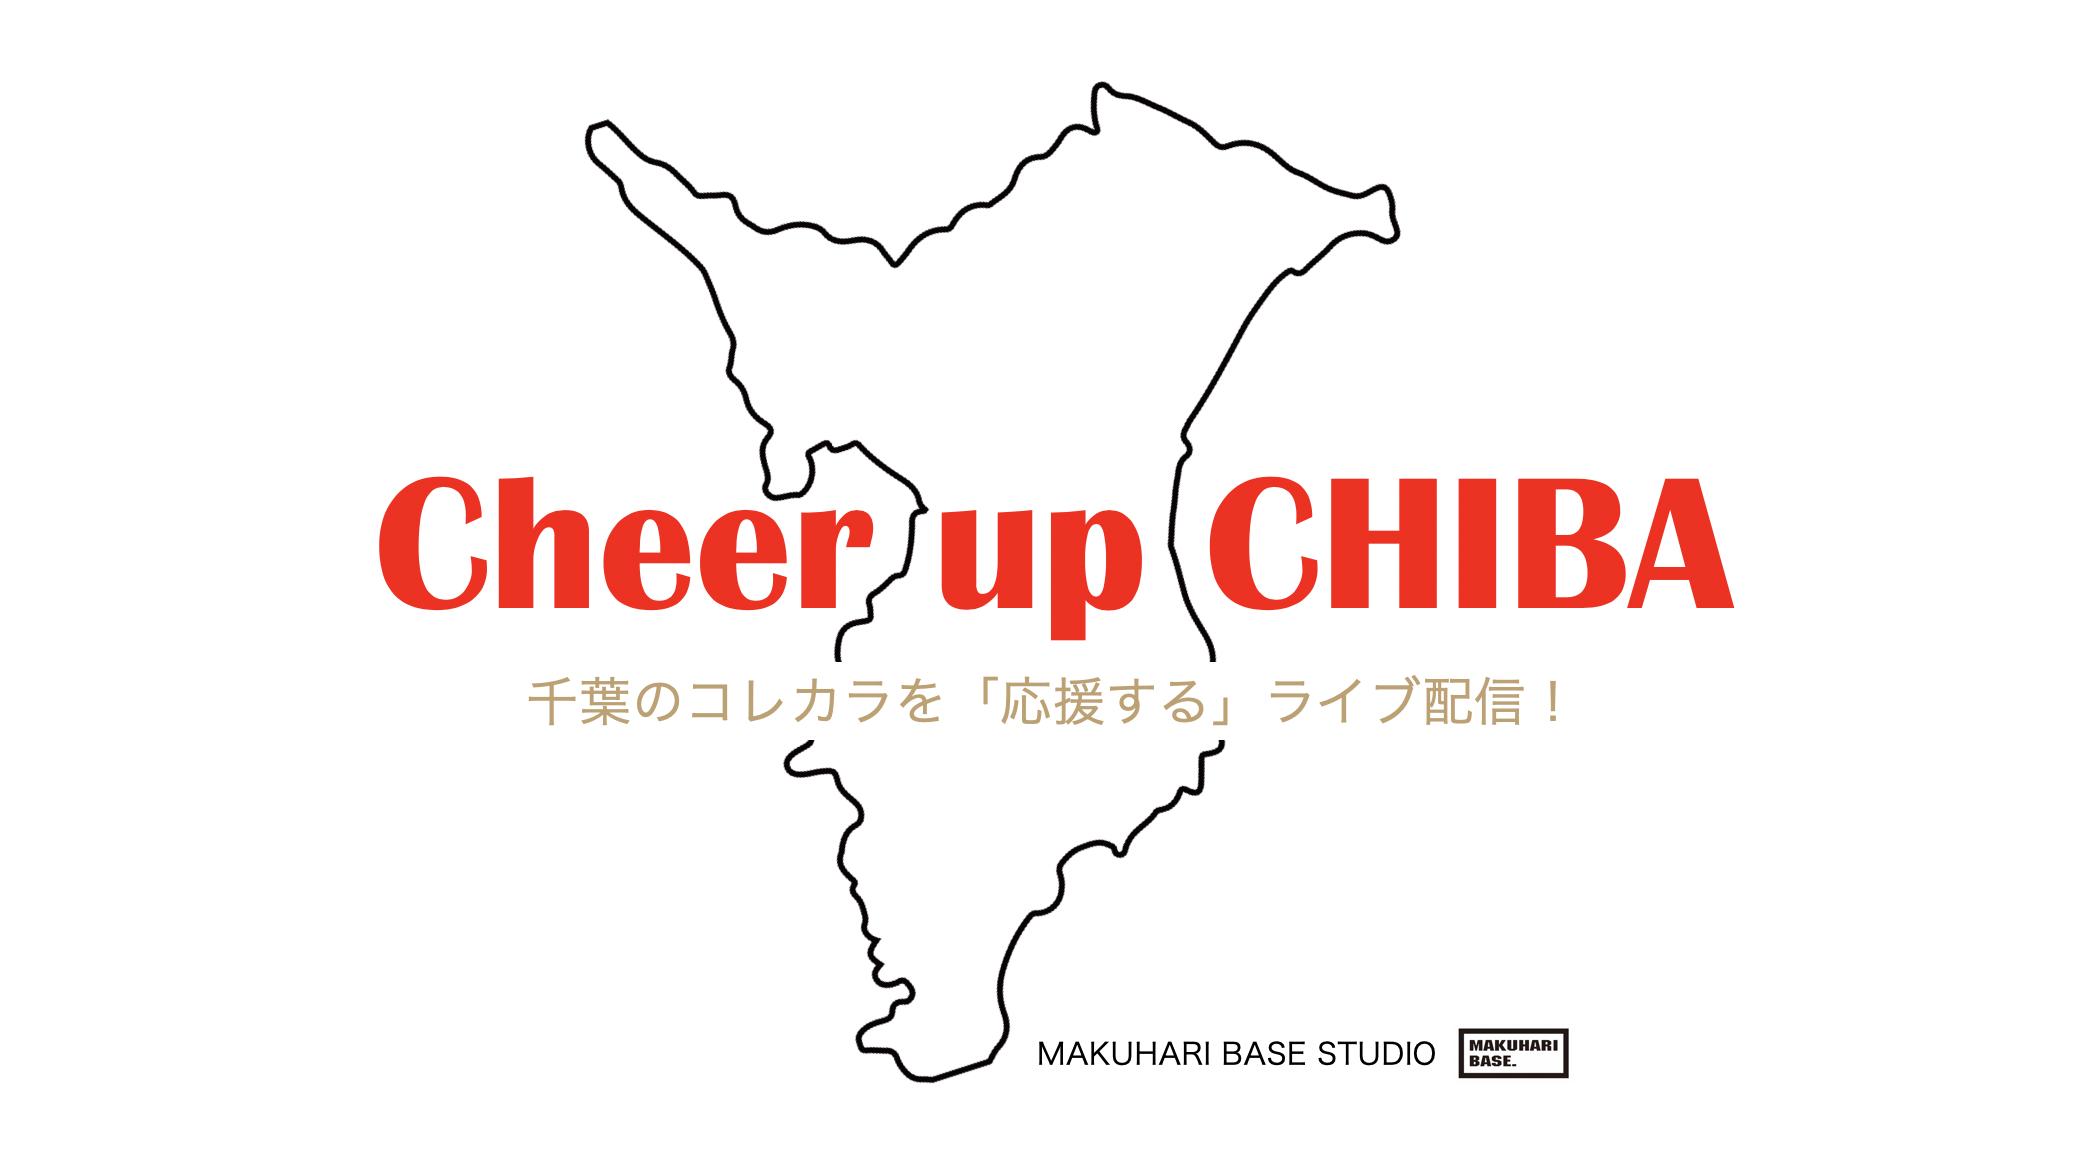 Cheer up CHIBA 〜千葉のコレカラを「応援する」LIVE配信〜